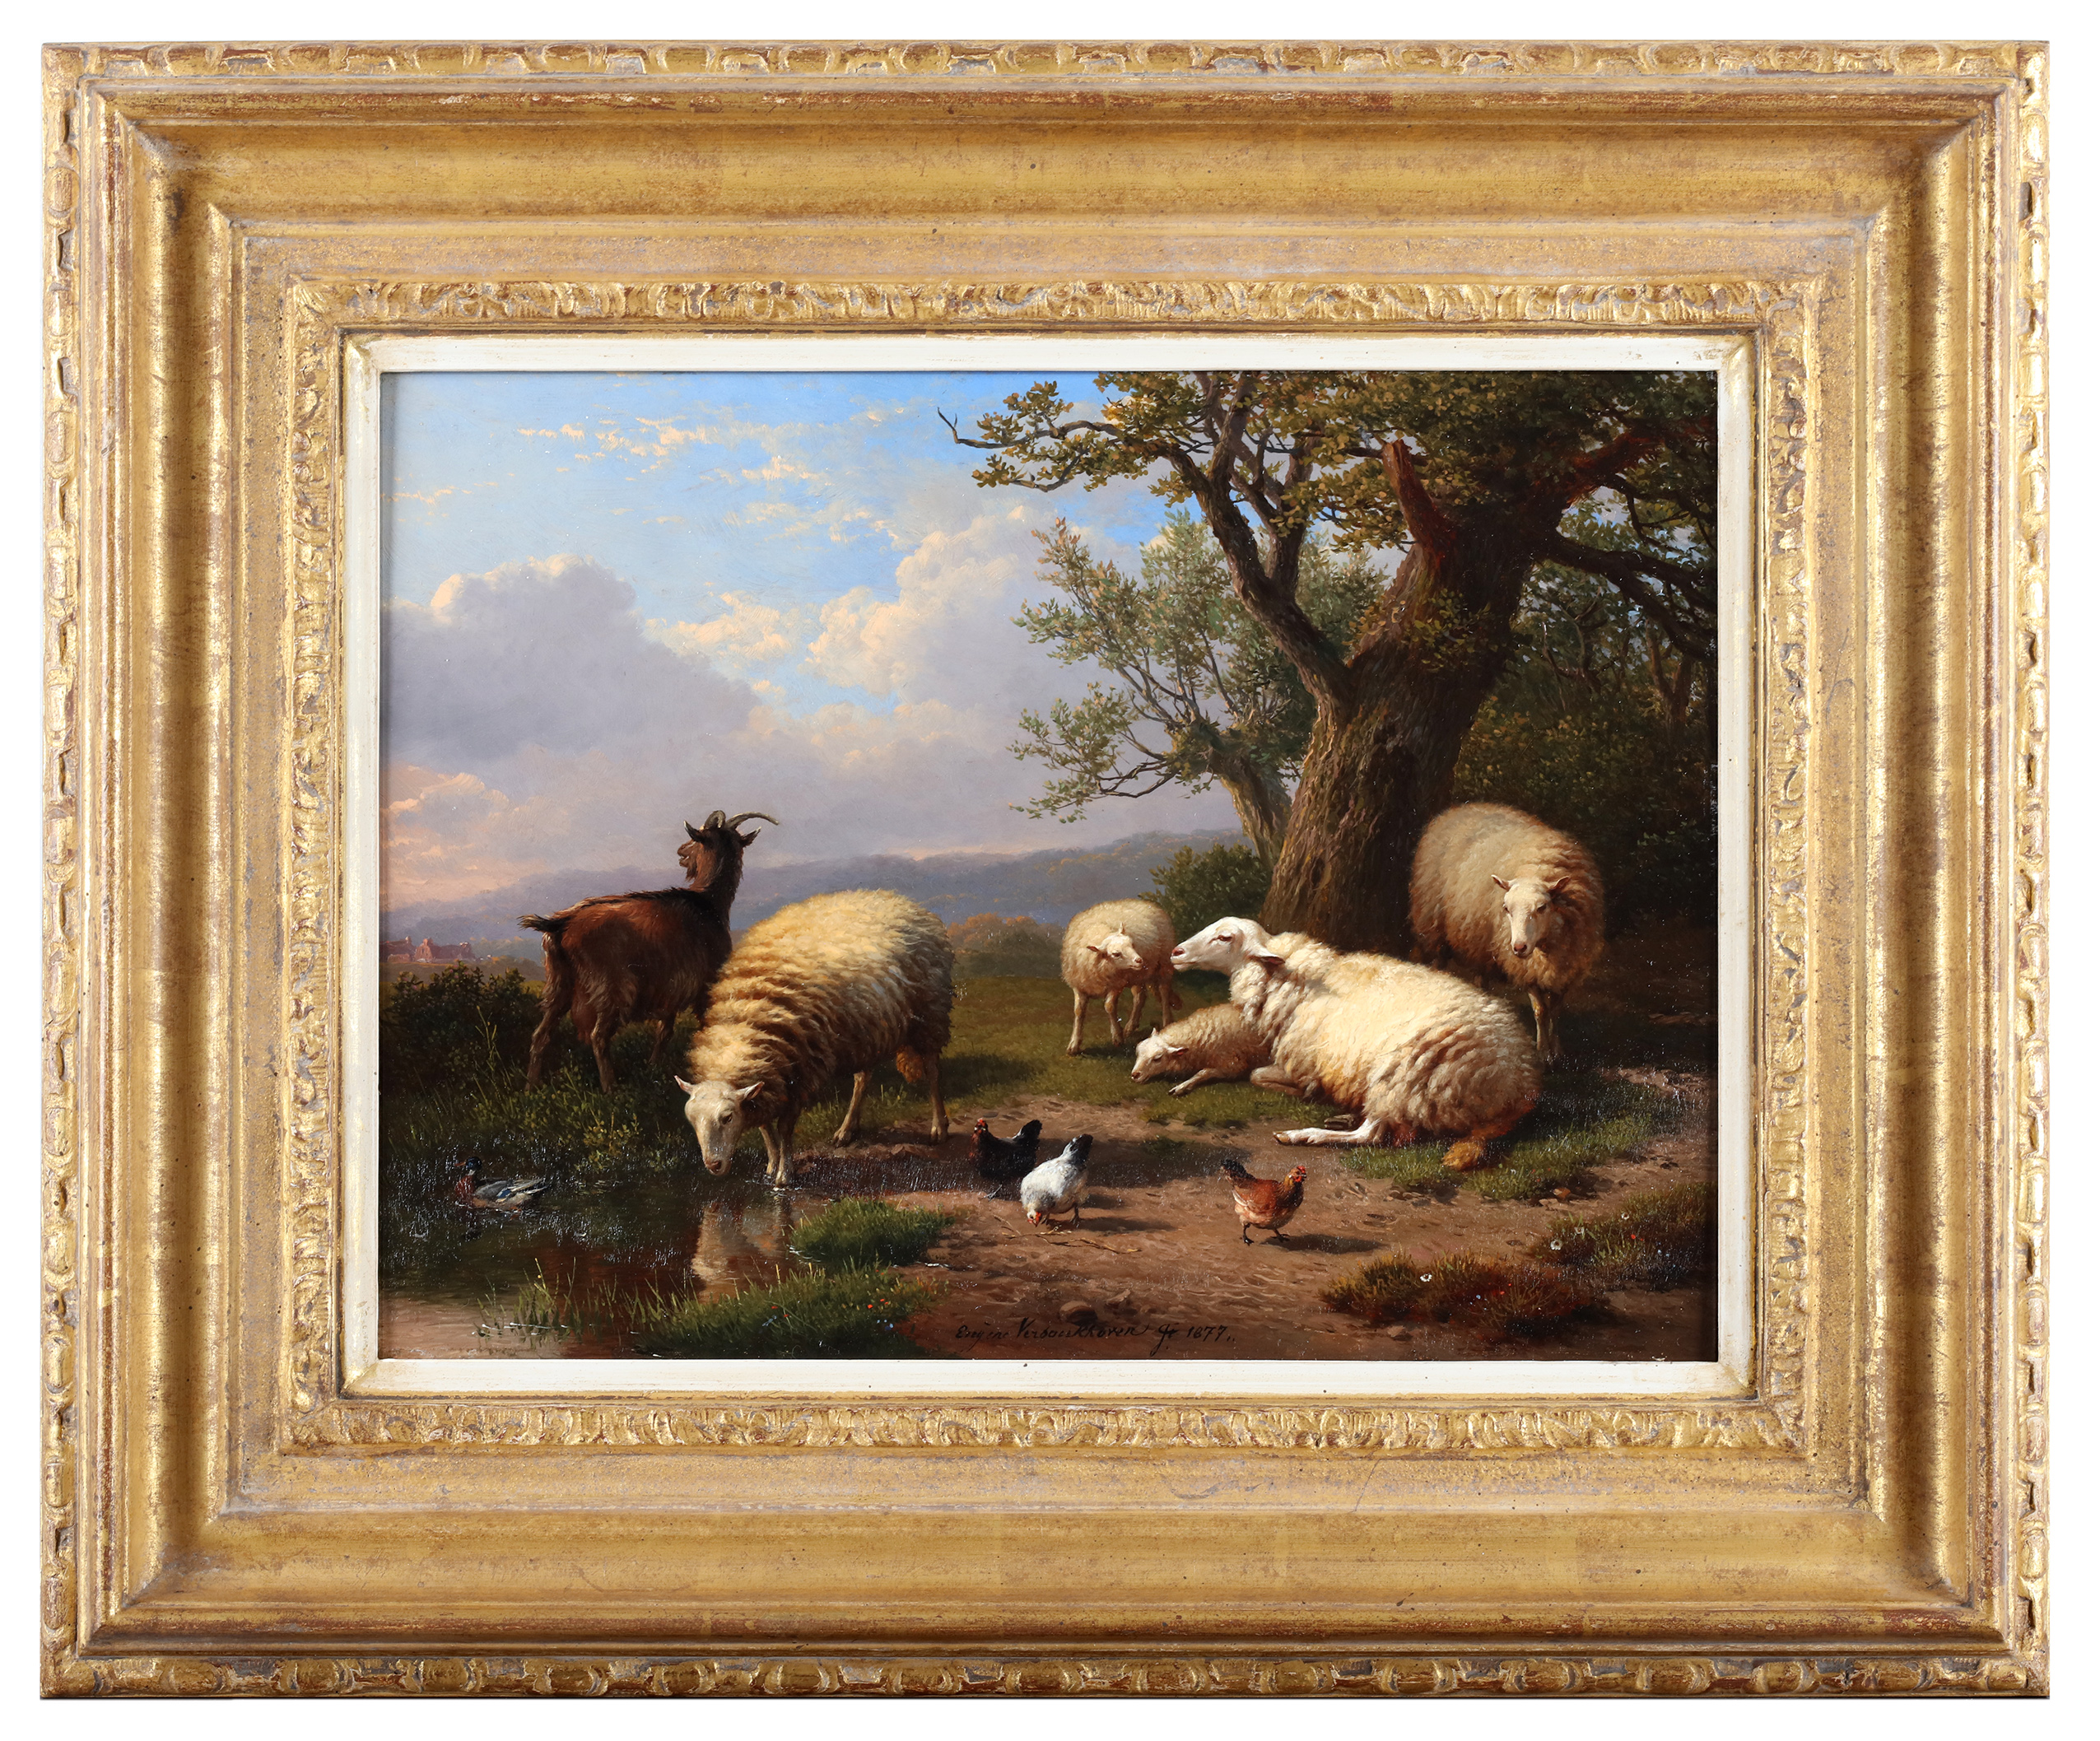 A gathering of farm animals